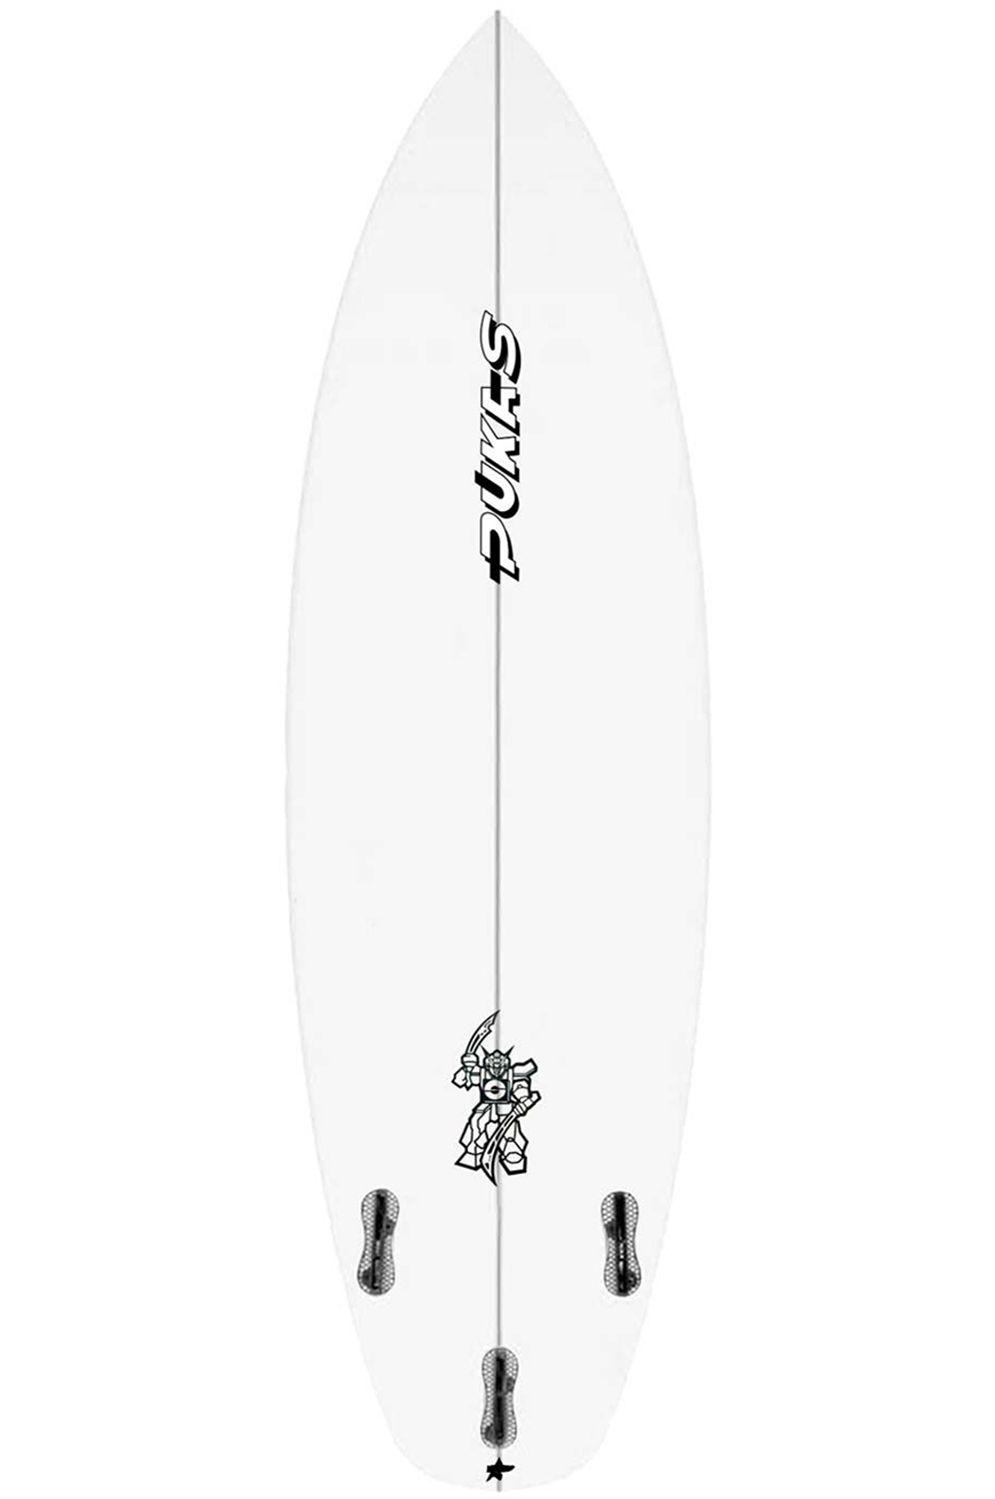 Prancha Surf Pukas 5'10 WAVE SLAVE Squash Tail - White FCS II 5ft10